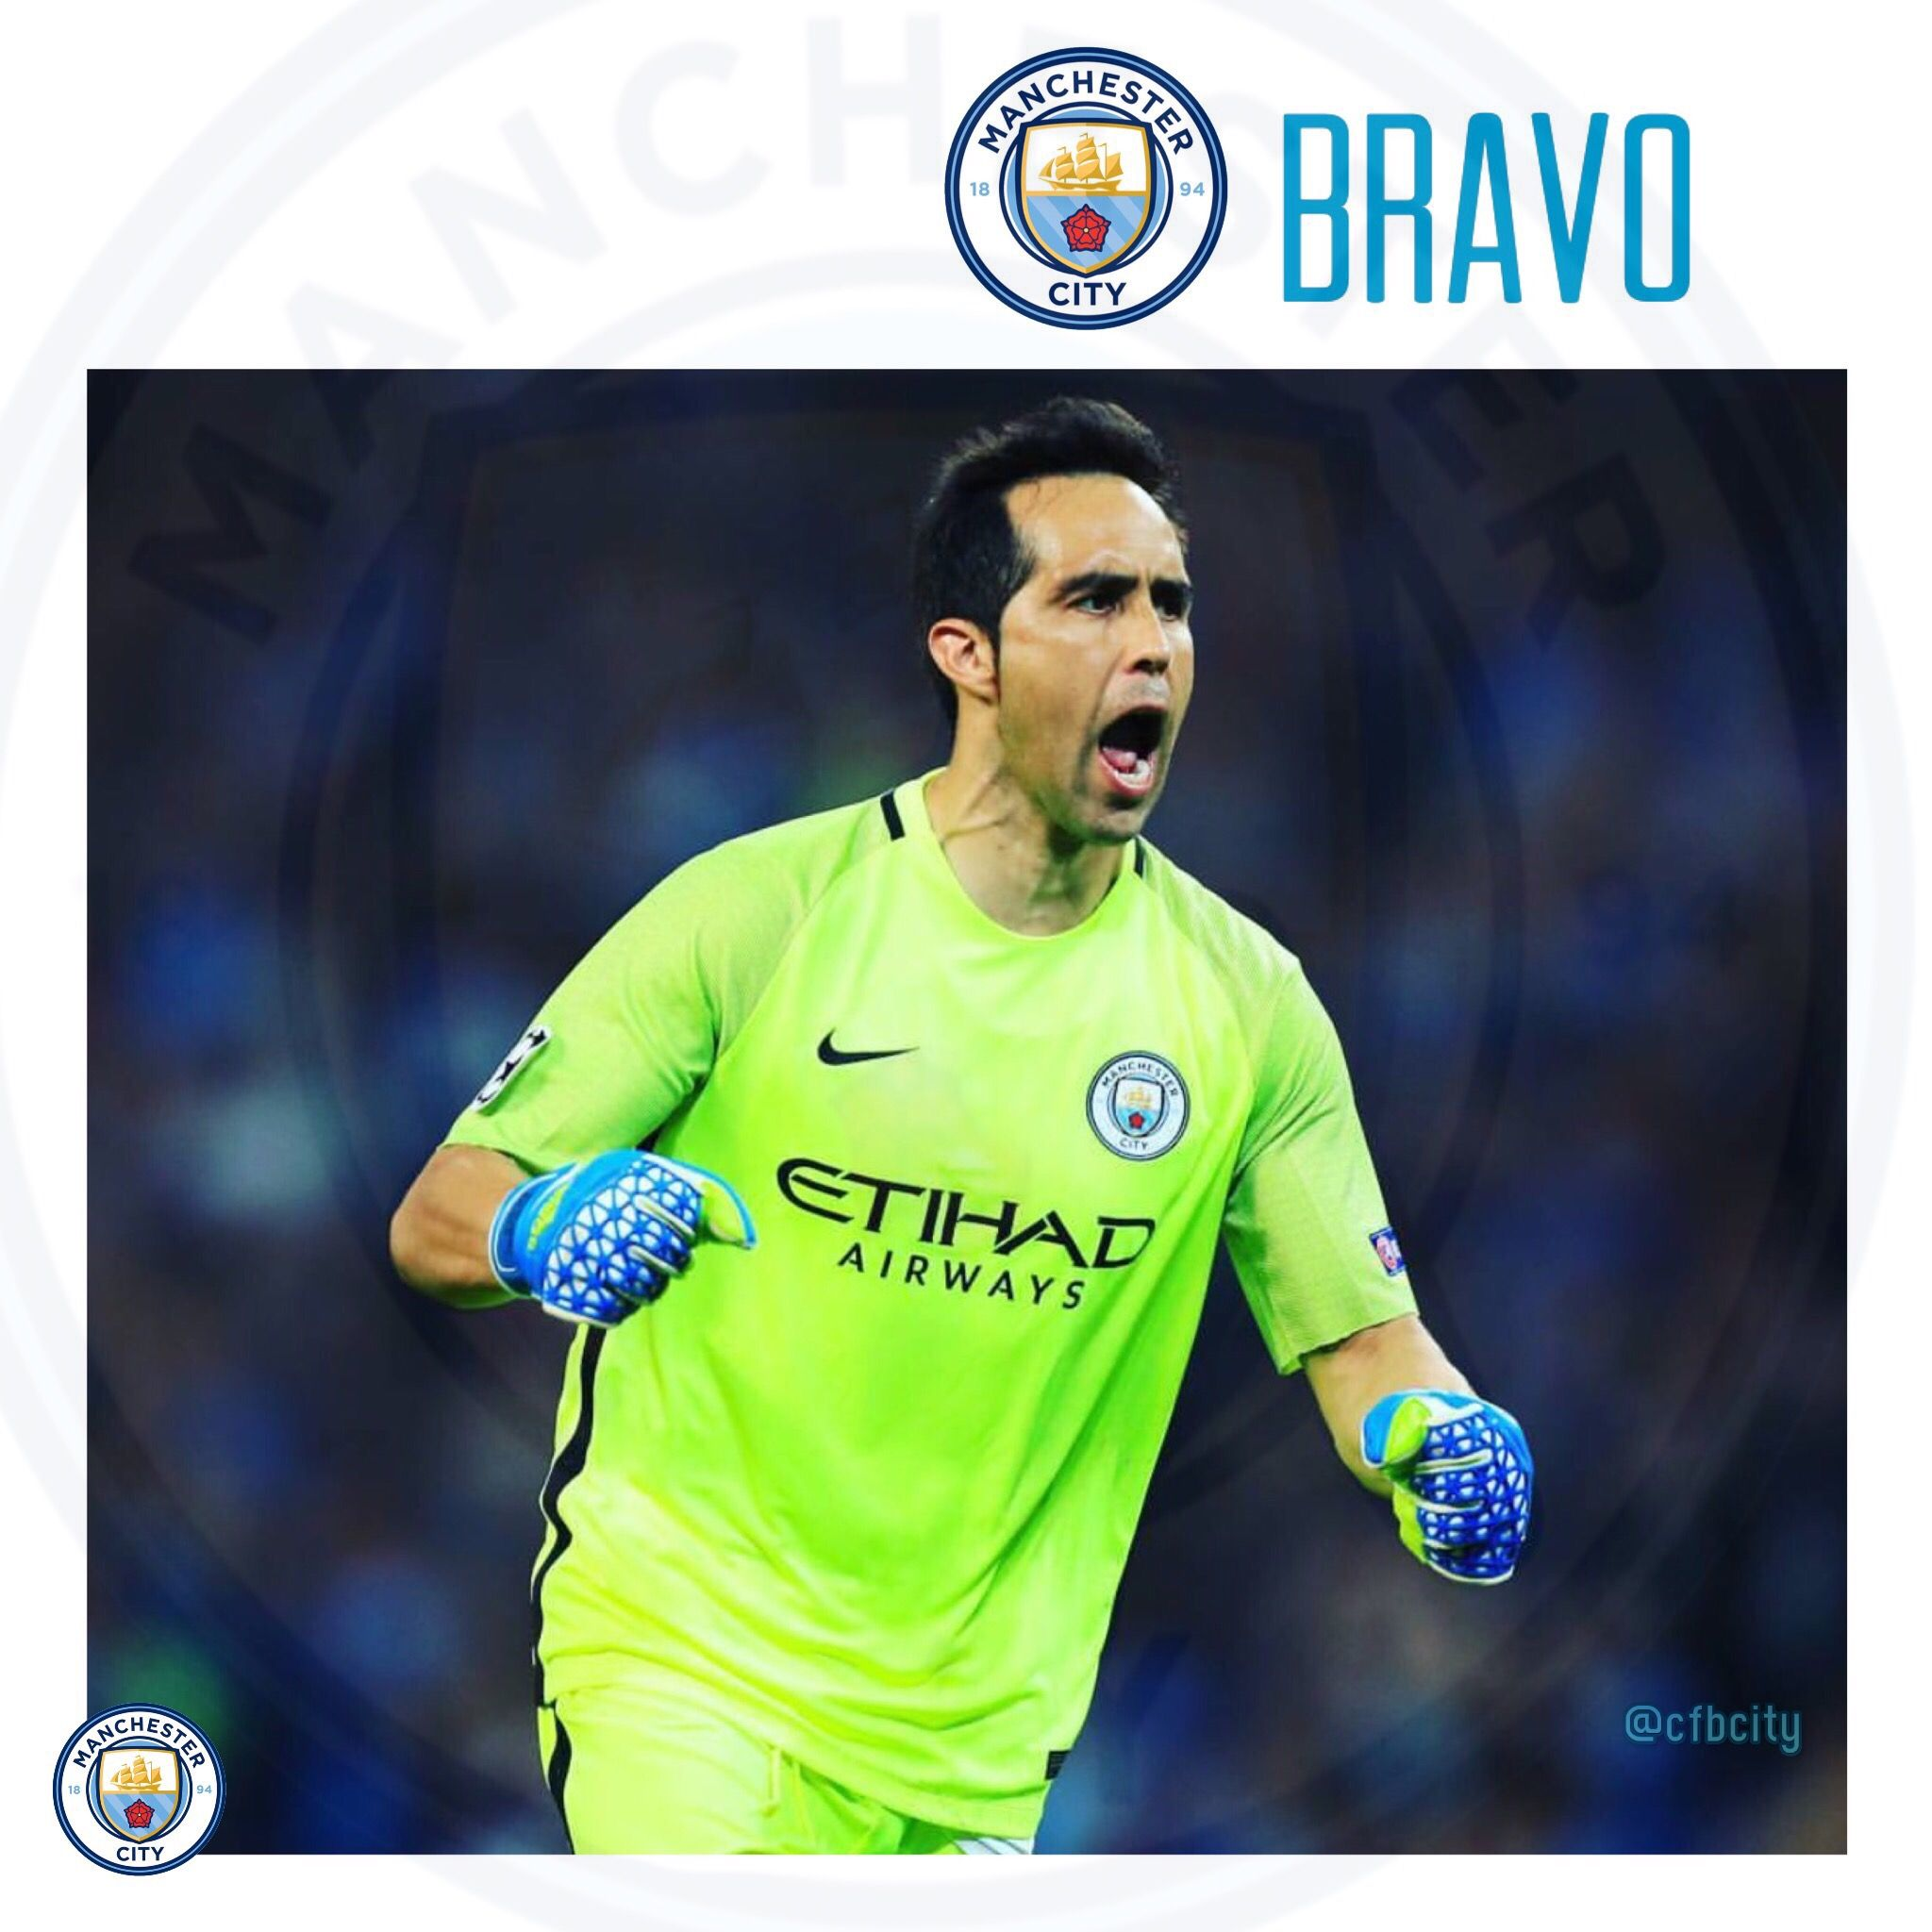 Official Manchester City De-Bruyne 1718 Maxi Poster 91.5 x 61cm The Sky Blue